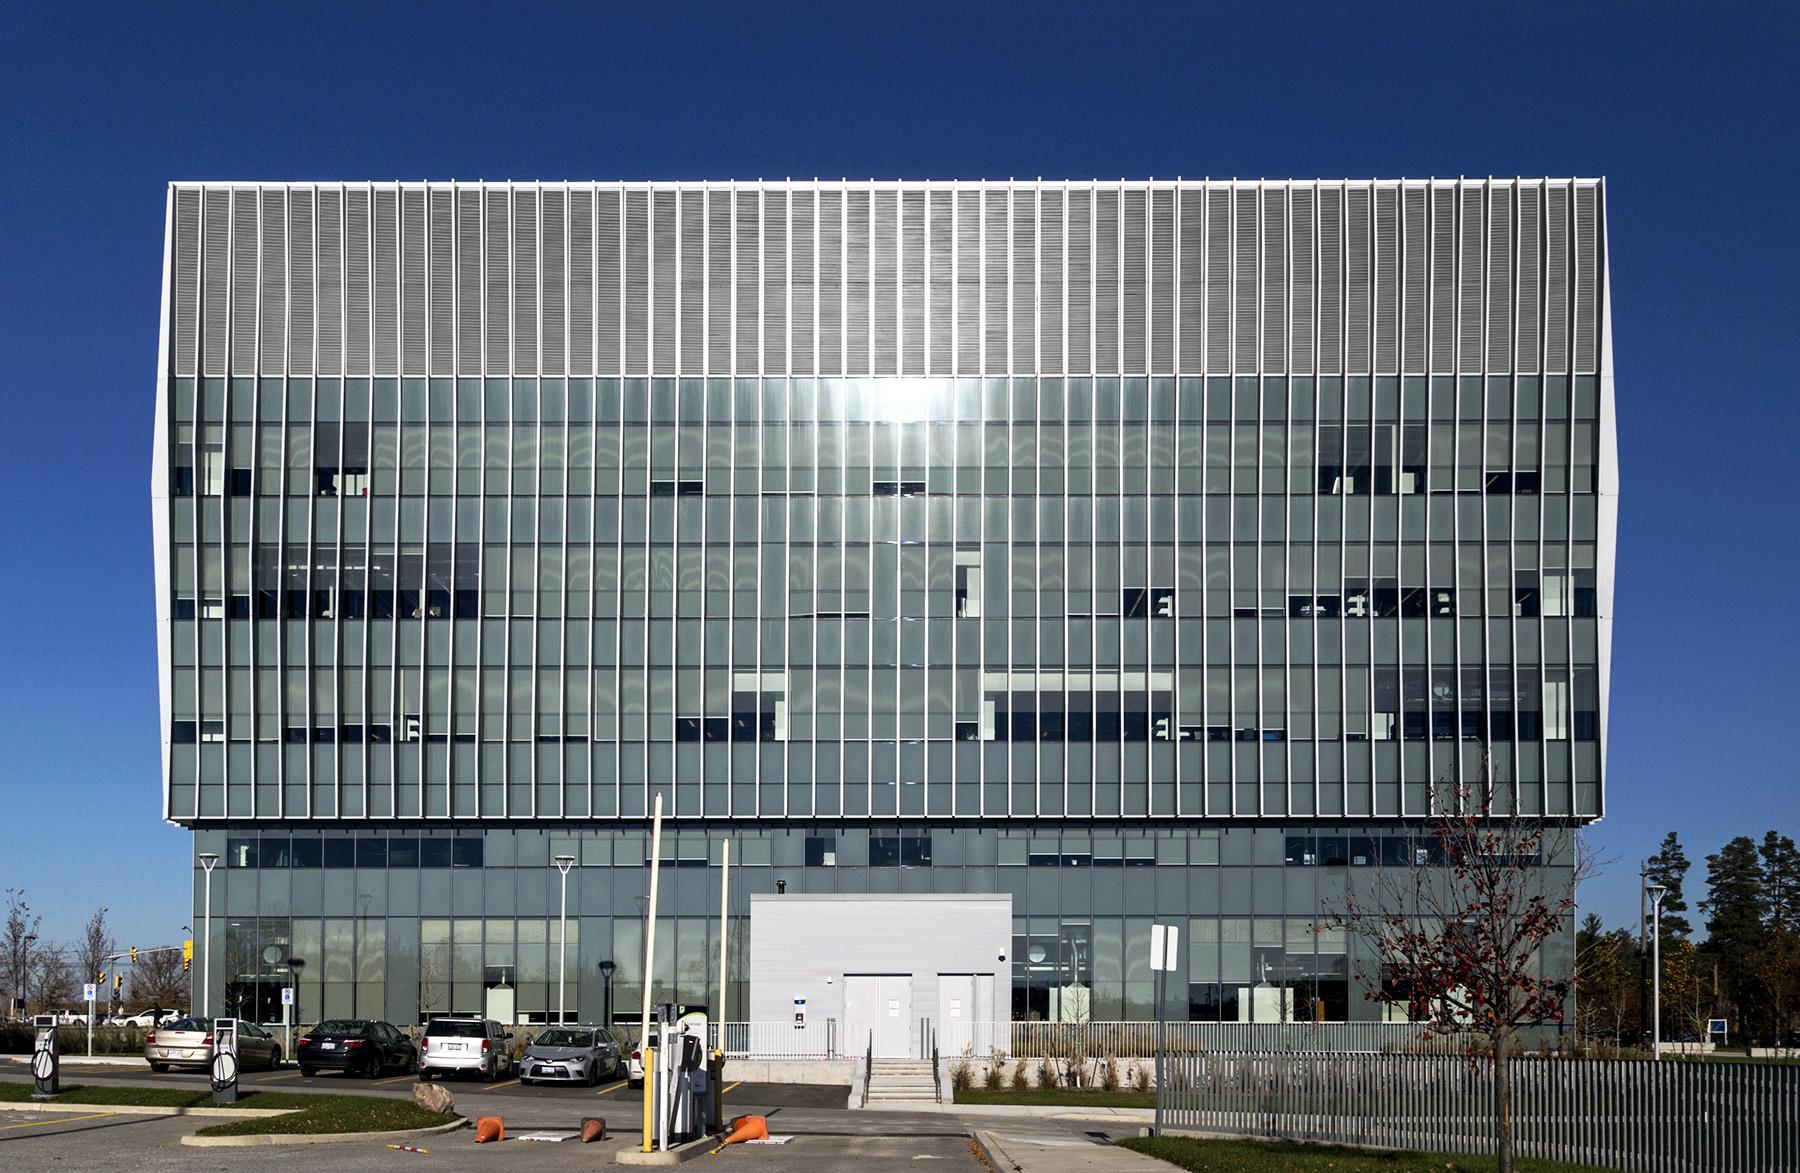 20151213. University of Toronto Scarborough's new Environmental